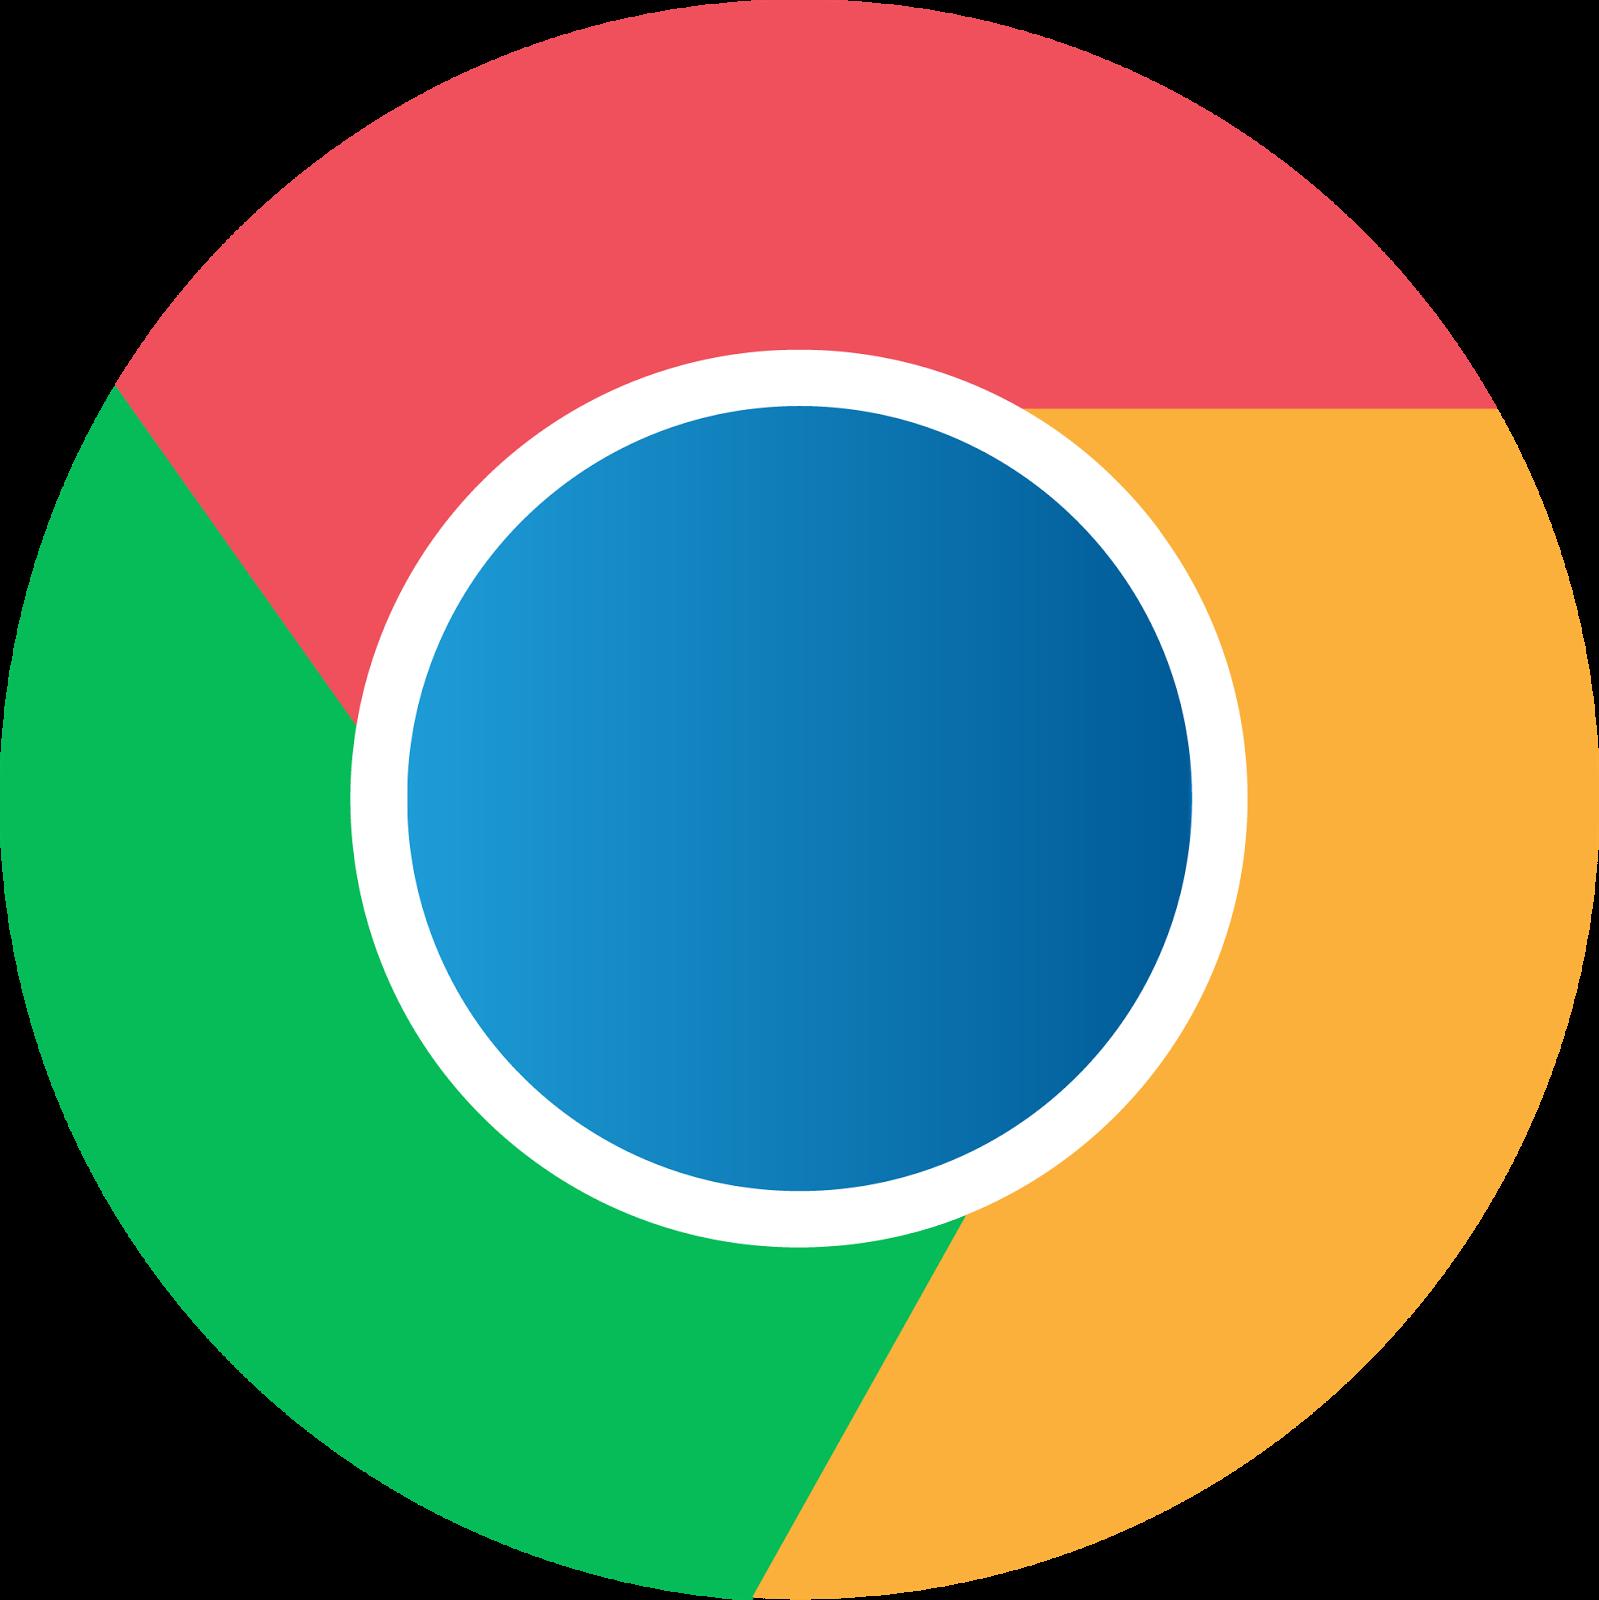 image transparent download Chrome logo PNG images free download